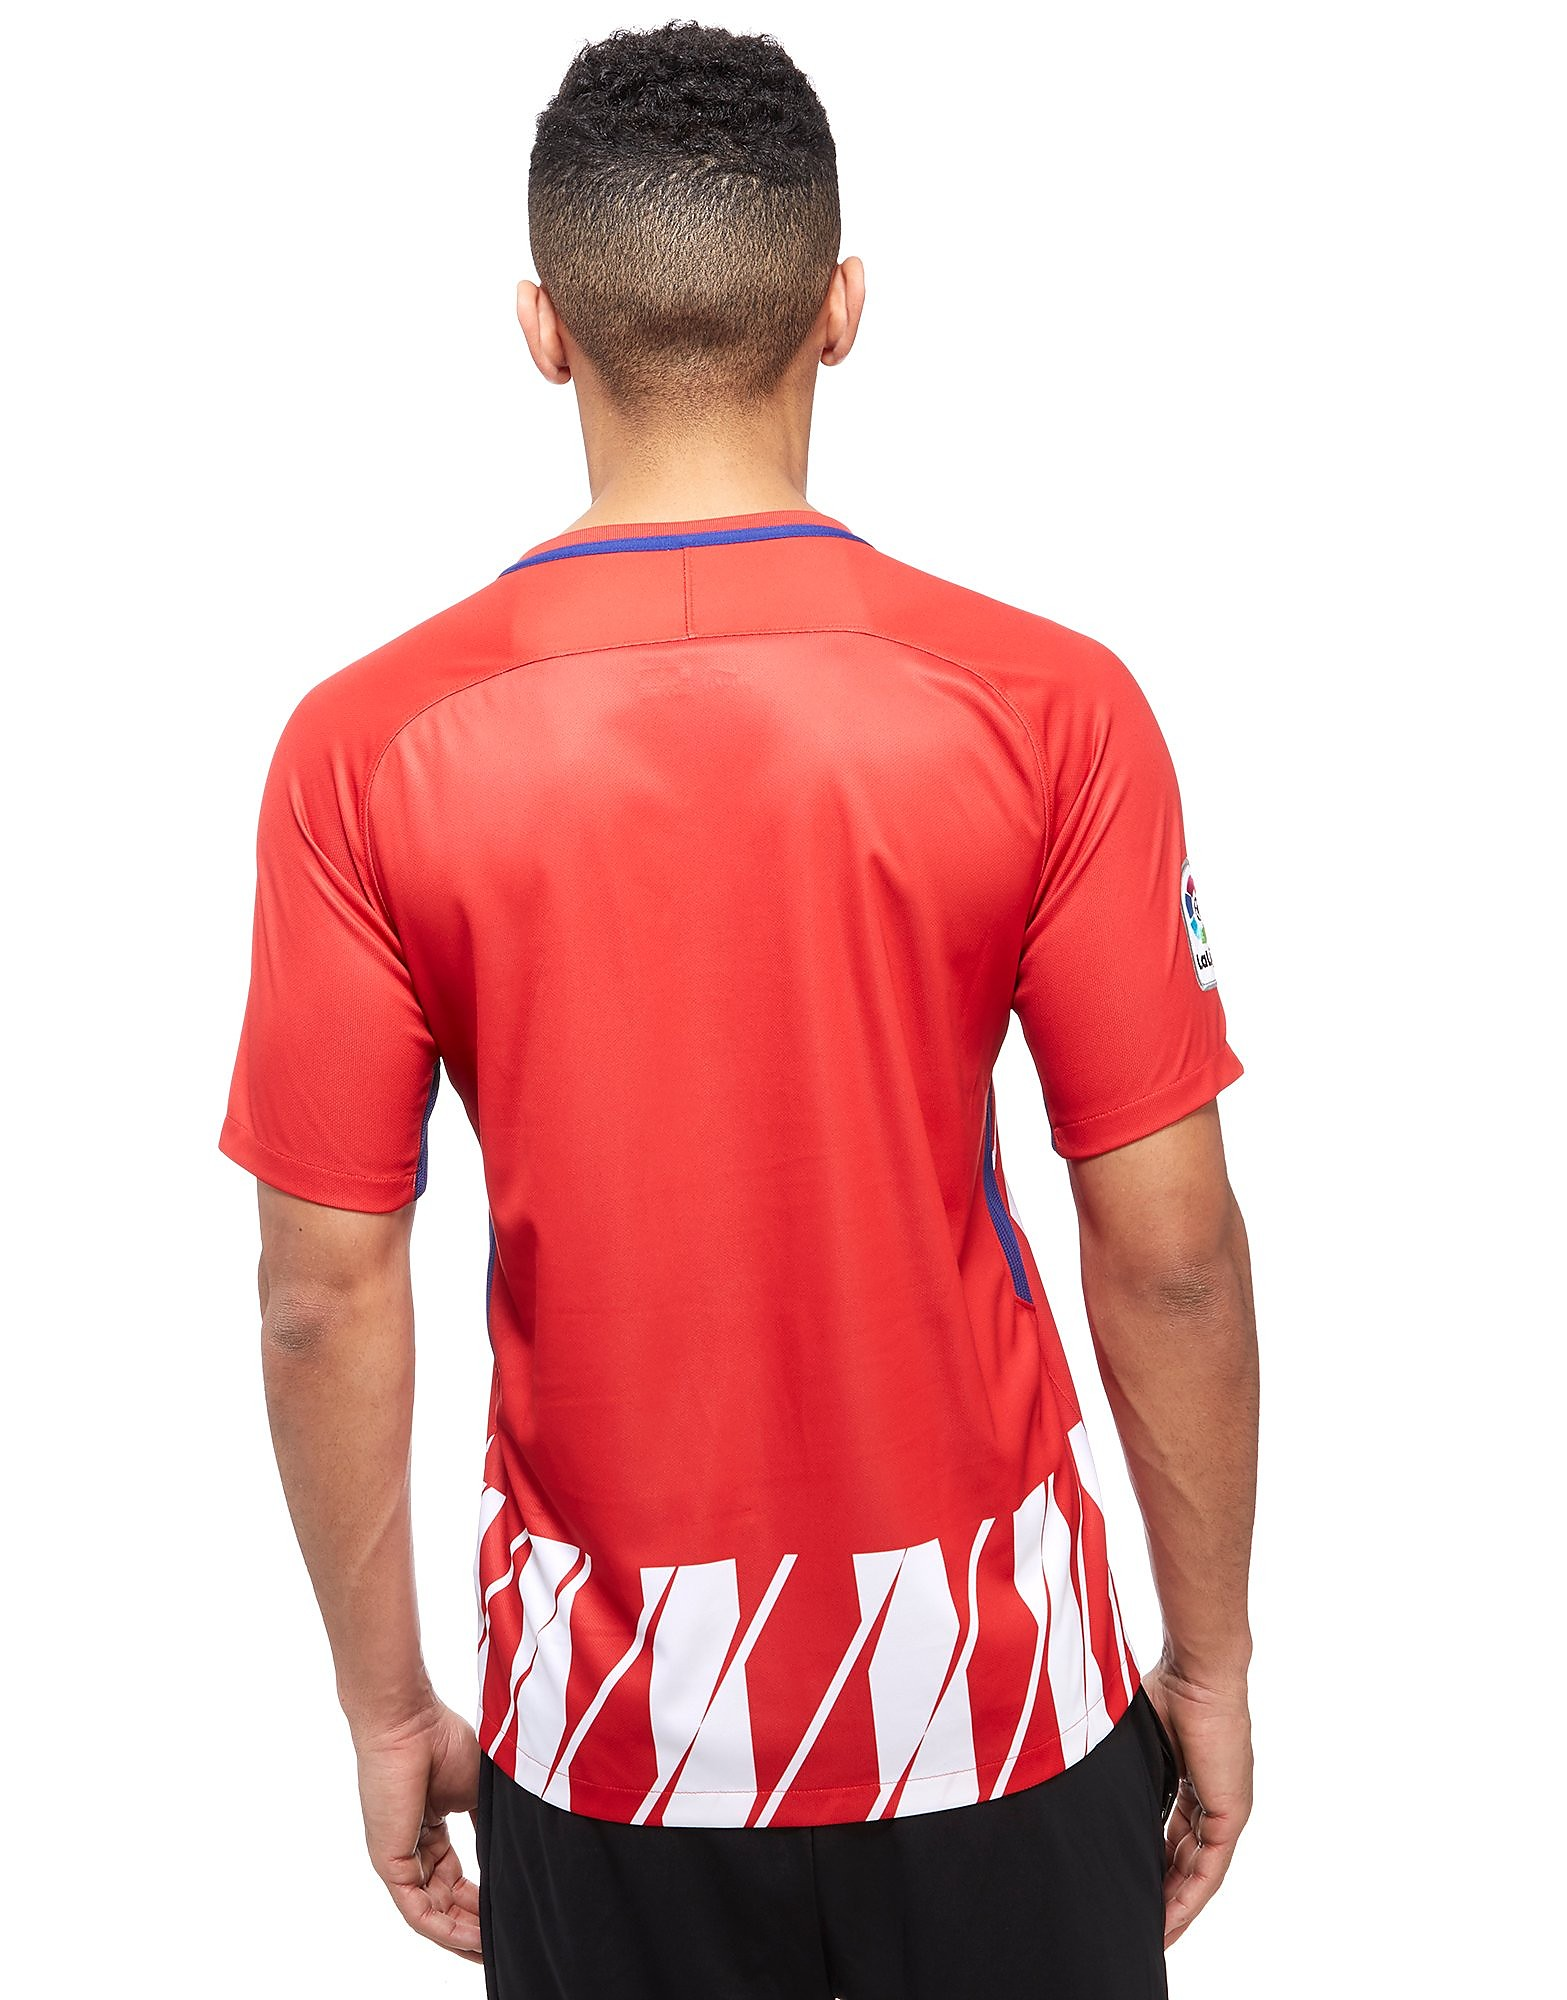 Nike Atletico Madrid 2017/18 Home Shirt